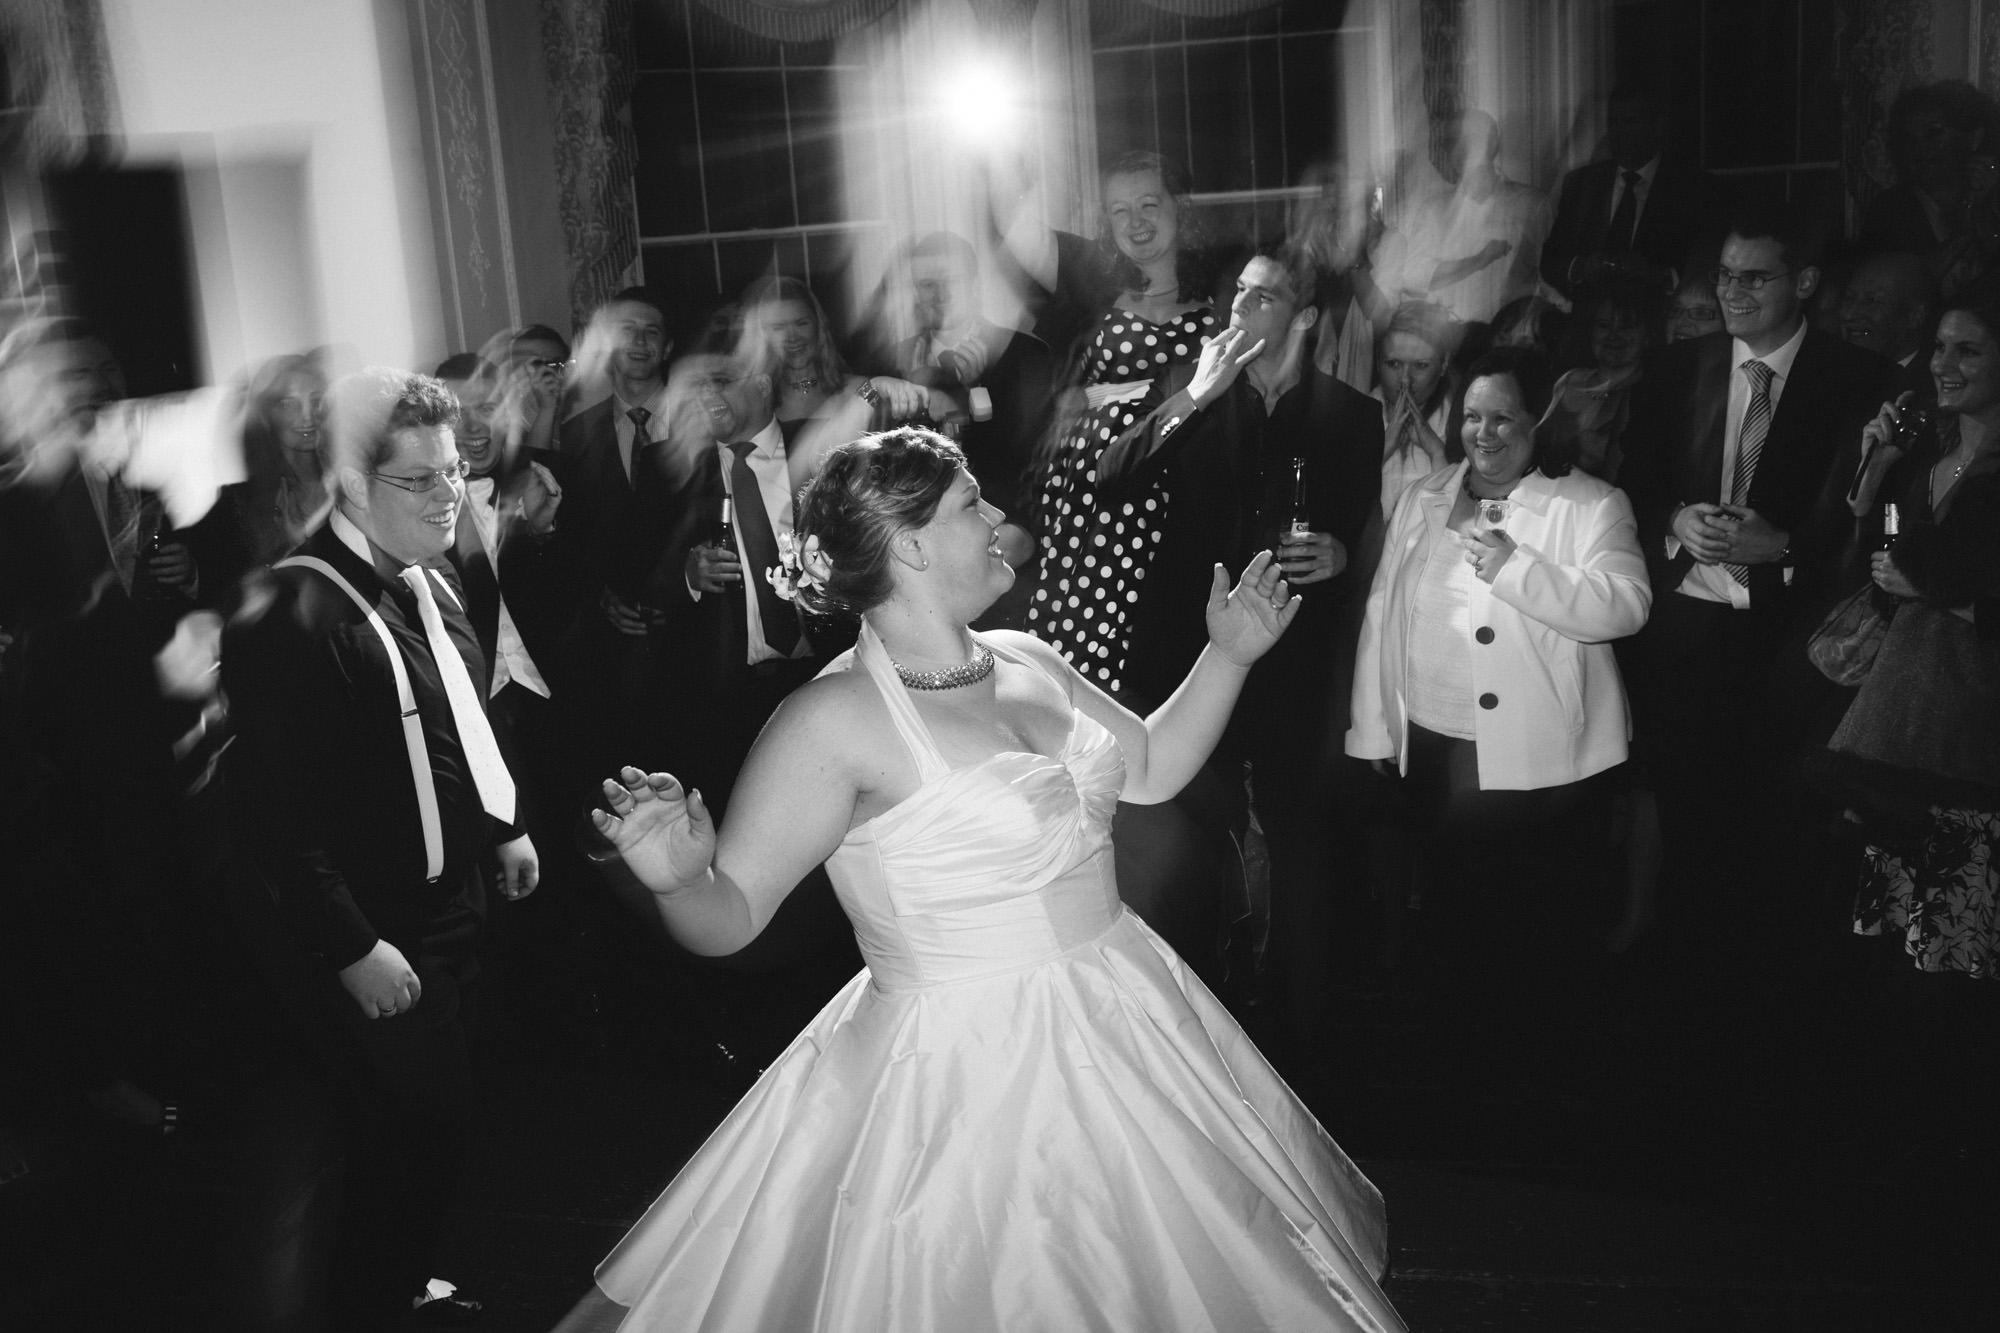 cambridge-wedding-photographer-io-080.jpg